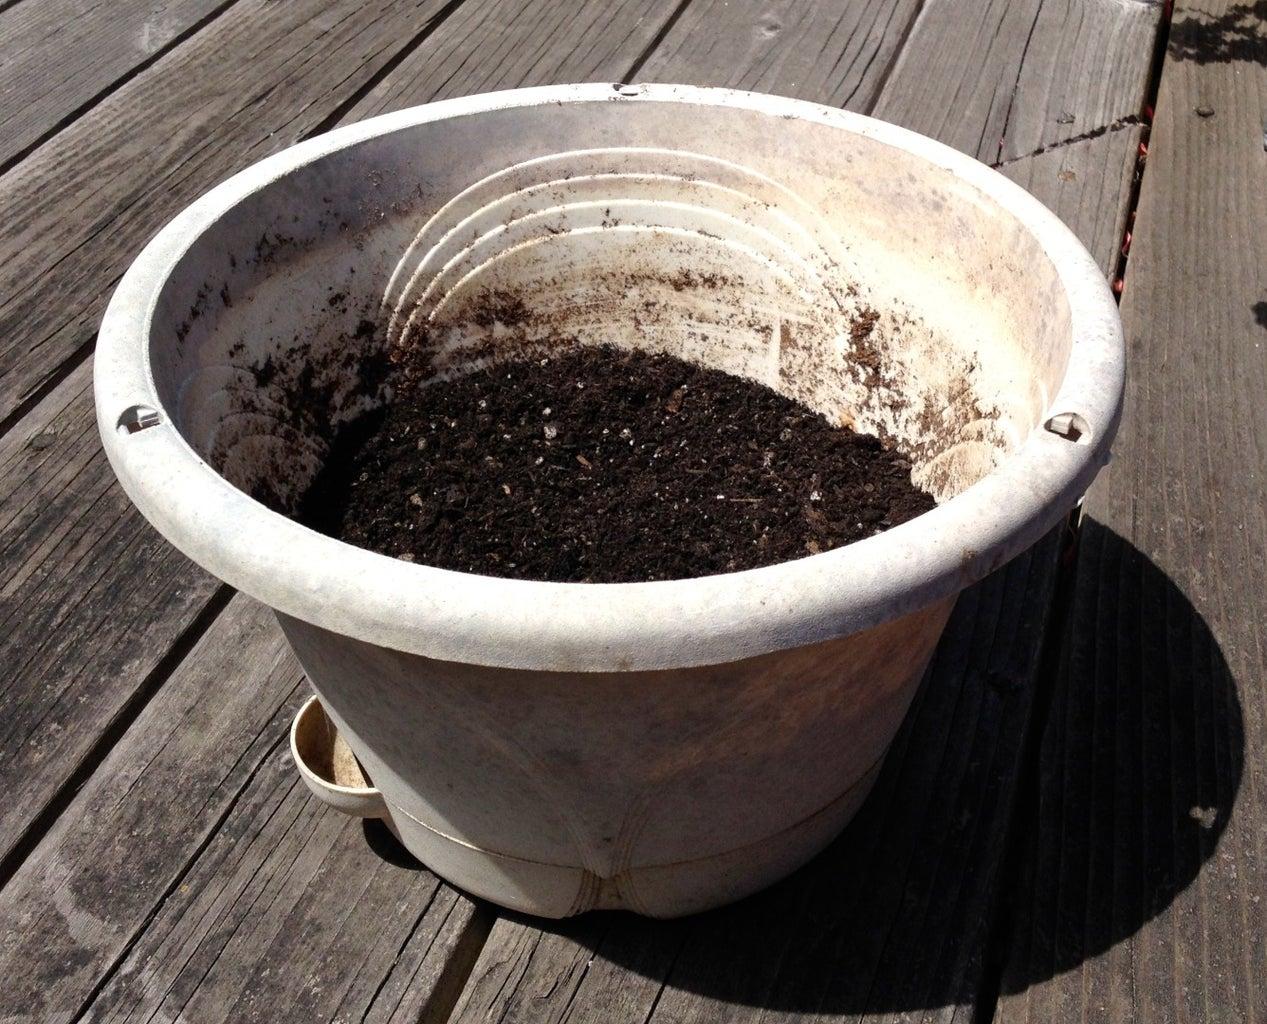 Step 1: Self-watering Pot